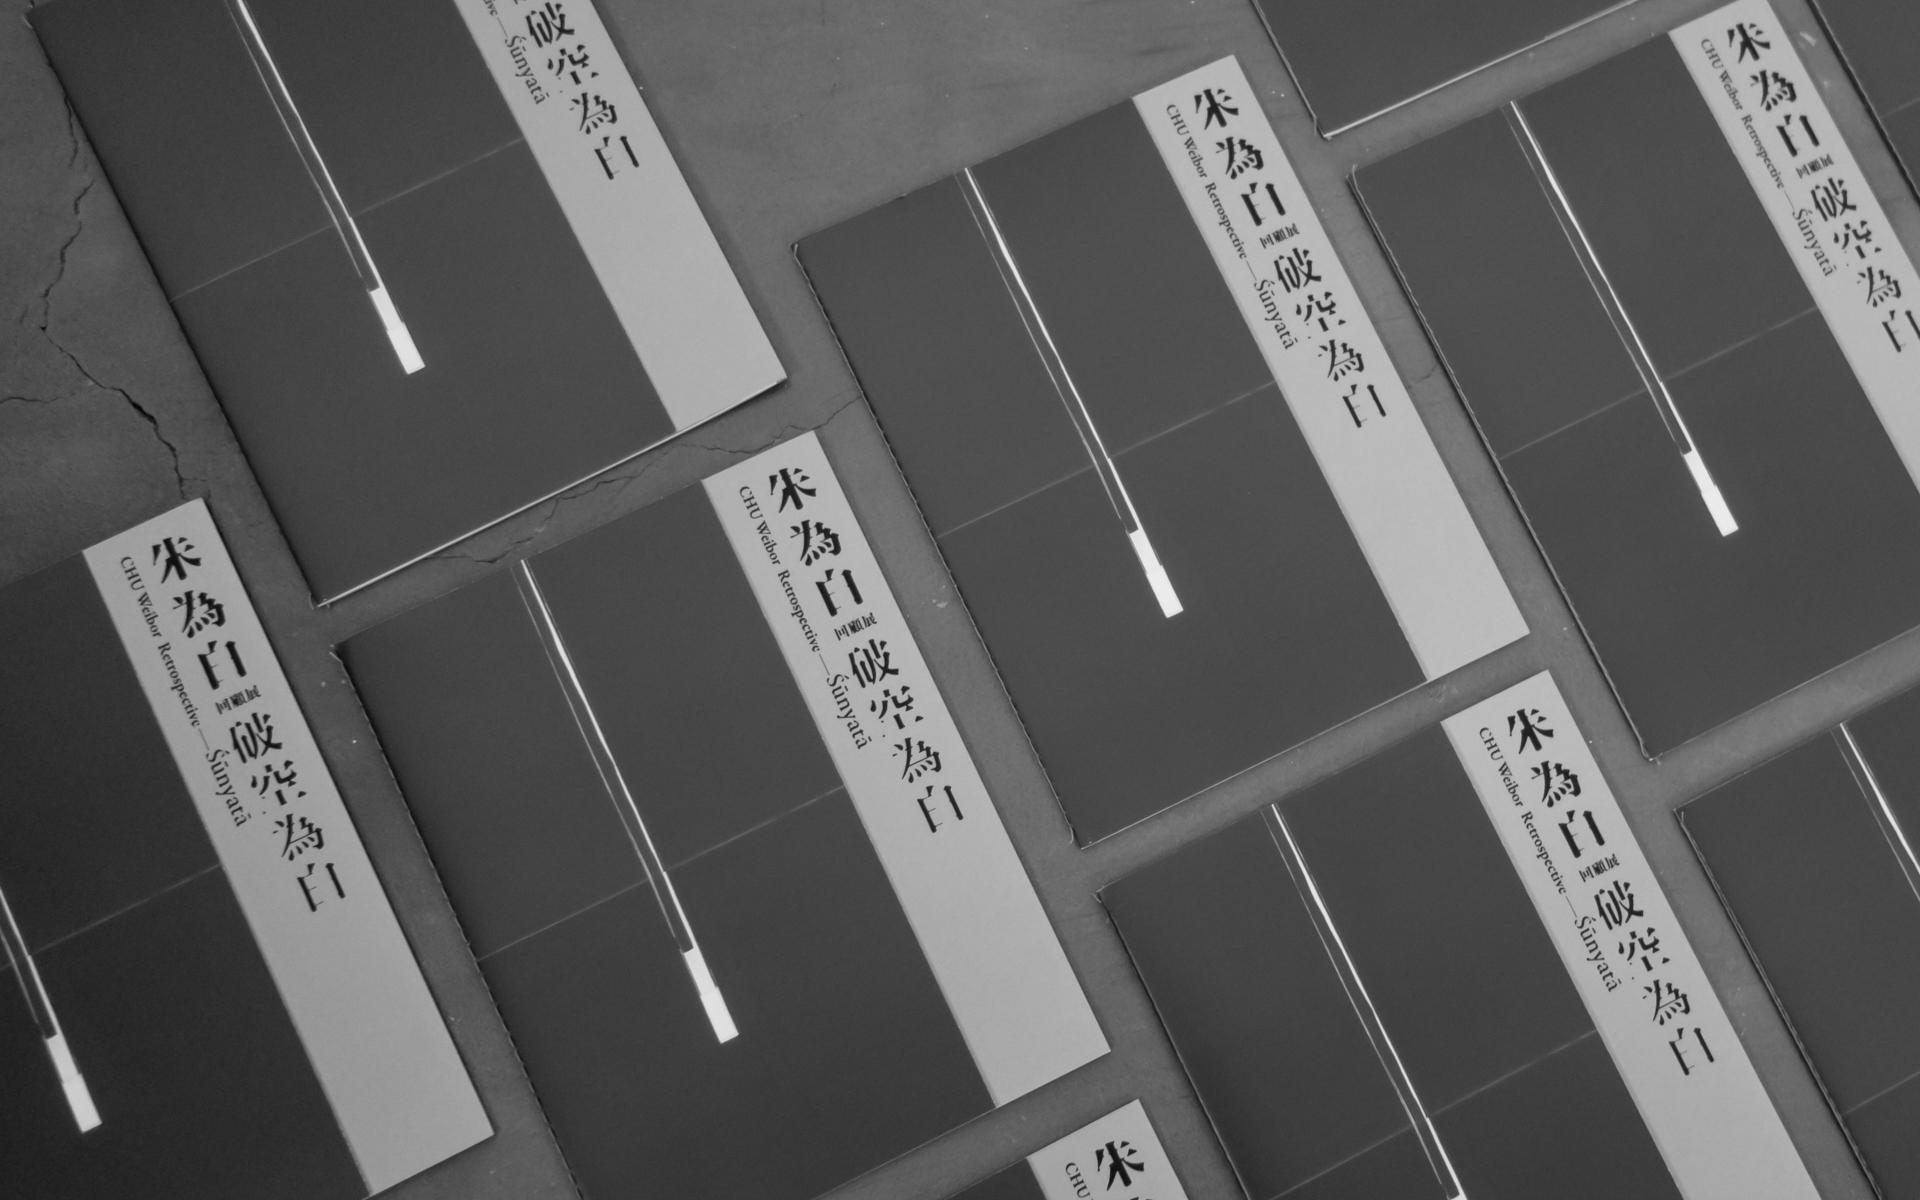 CHU Weibor Retrosprctive: Śūnyatā by Sung, Di-Yen - Creative Work